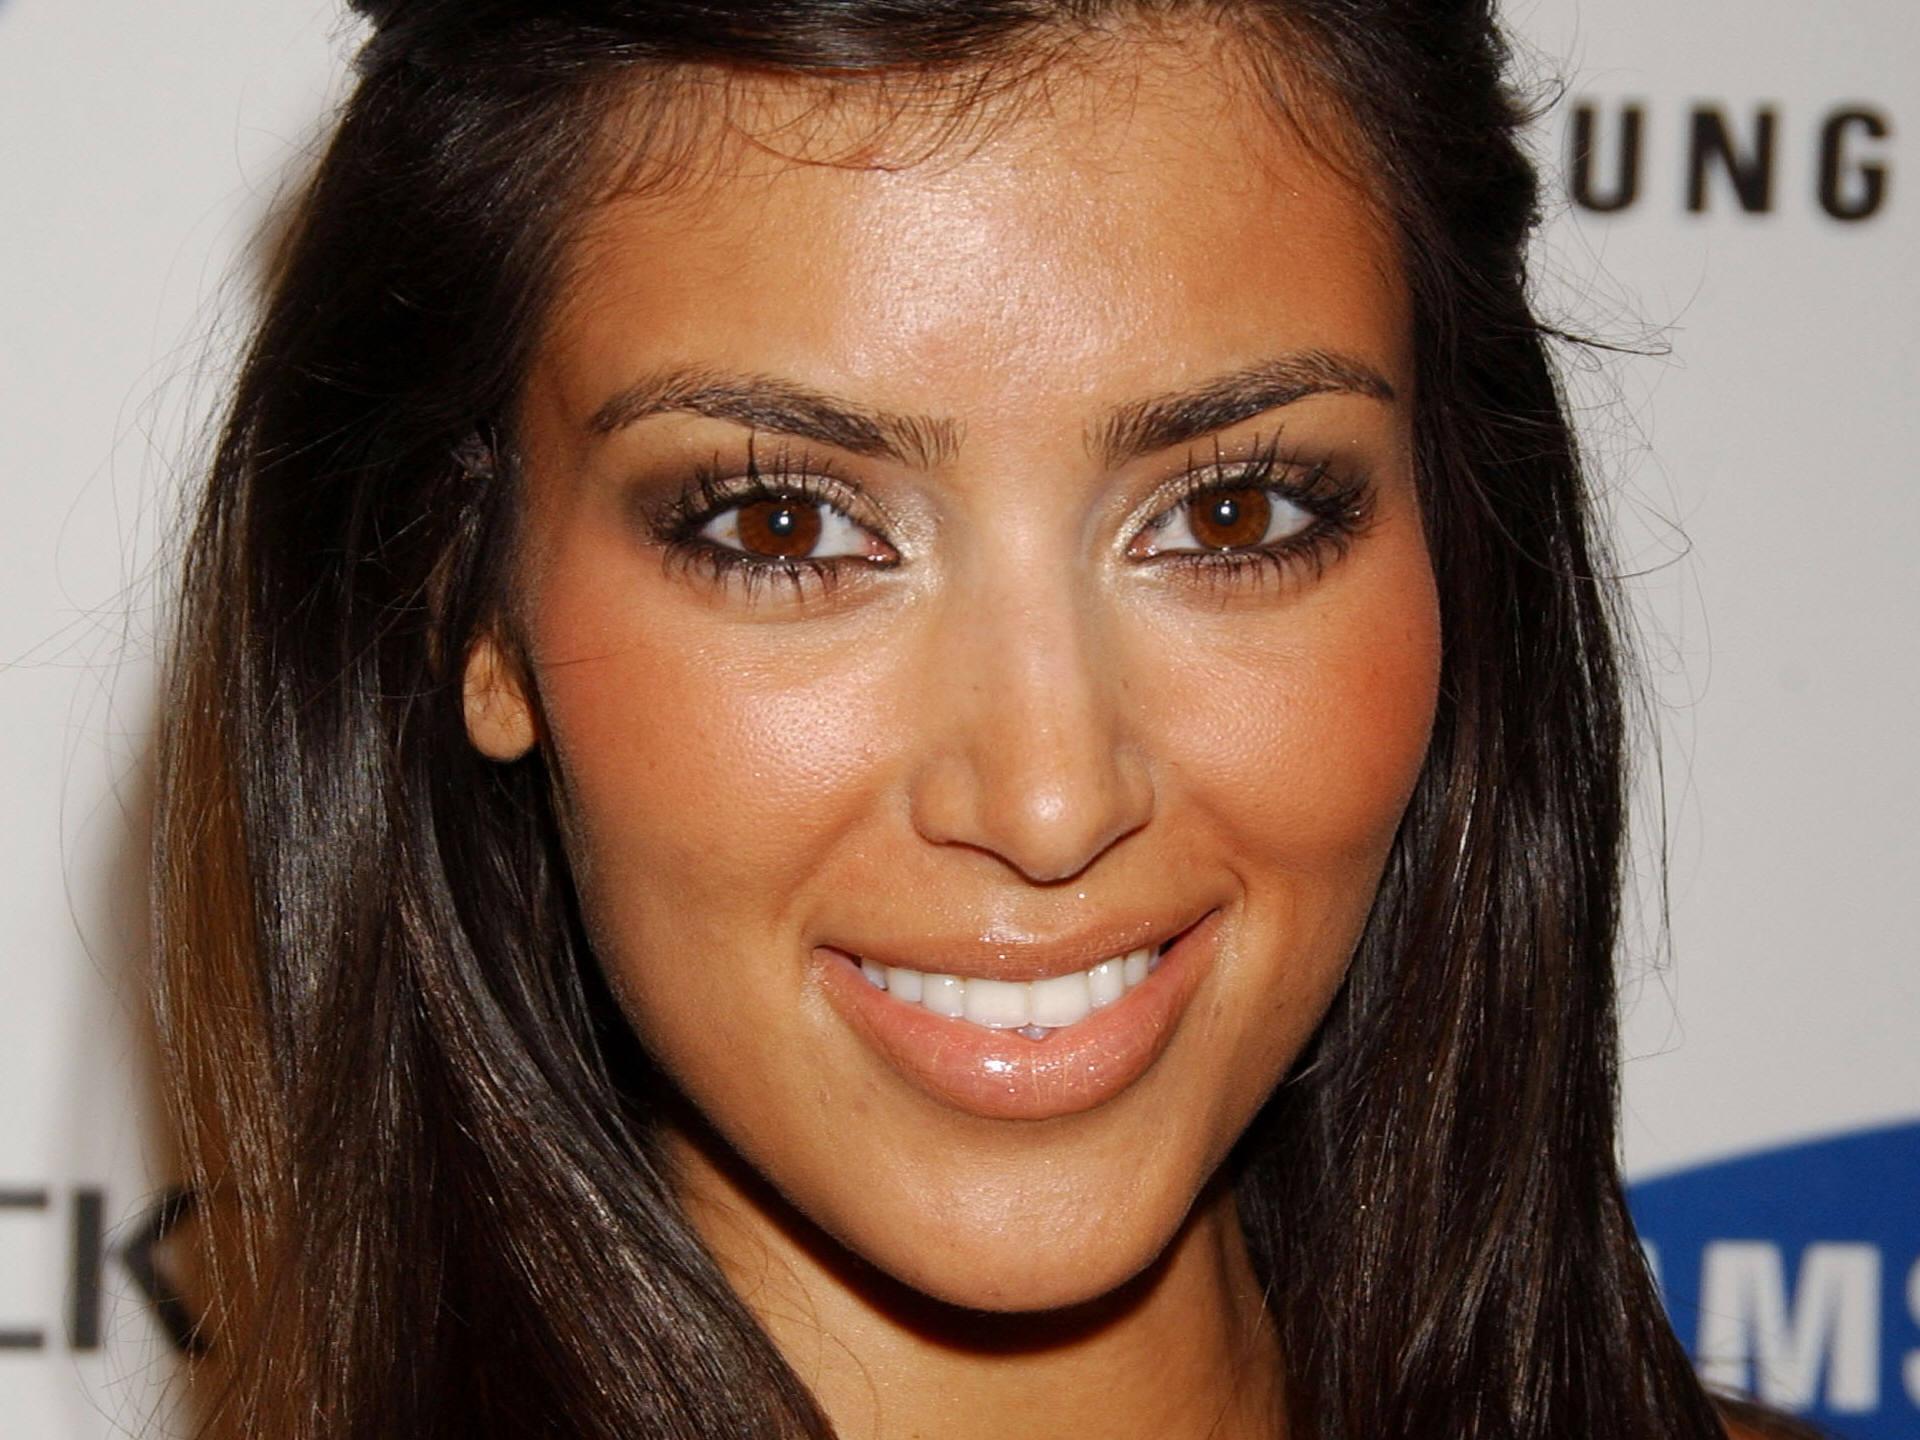 Kim Kardashian Hd Background Wallpaper 22 Thumb